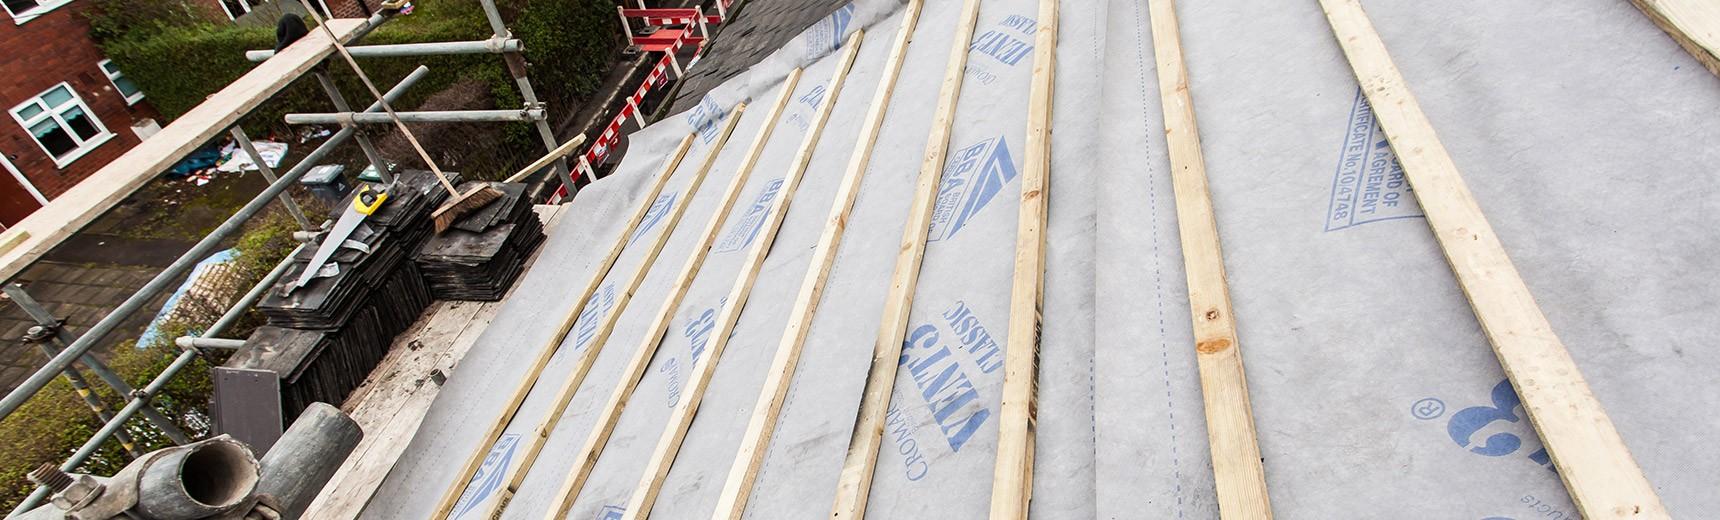 Roofing Glenfield Roofers Thorpe Astley Roof Repairs